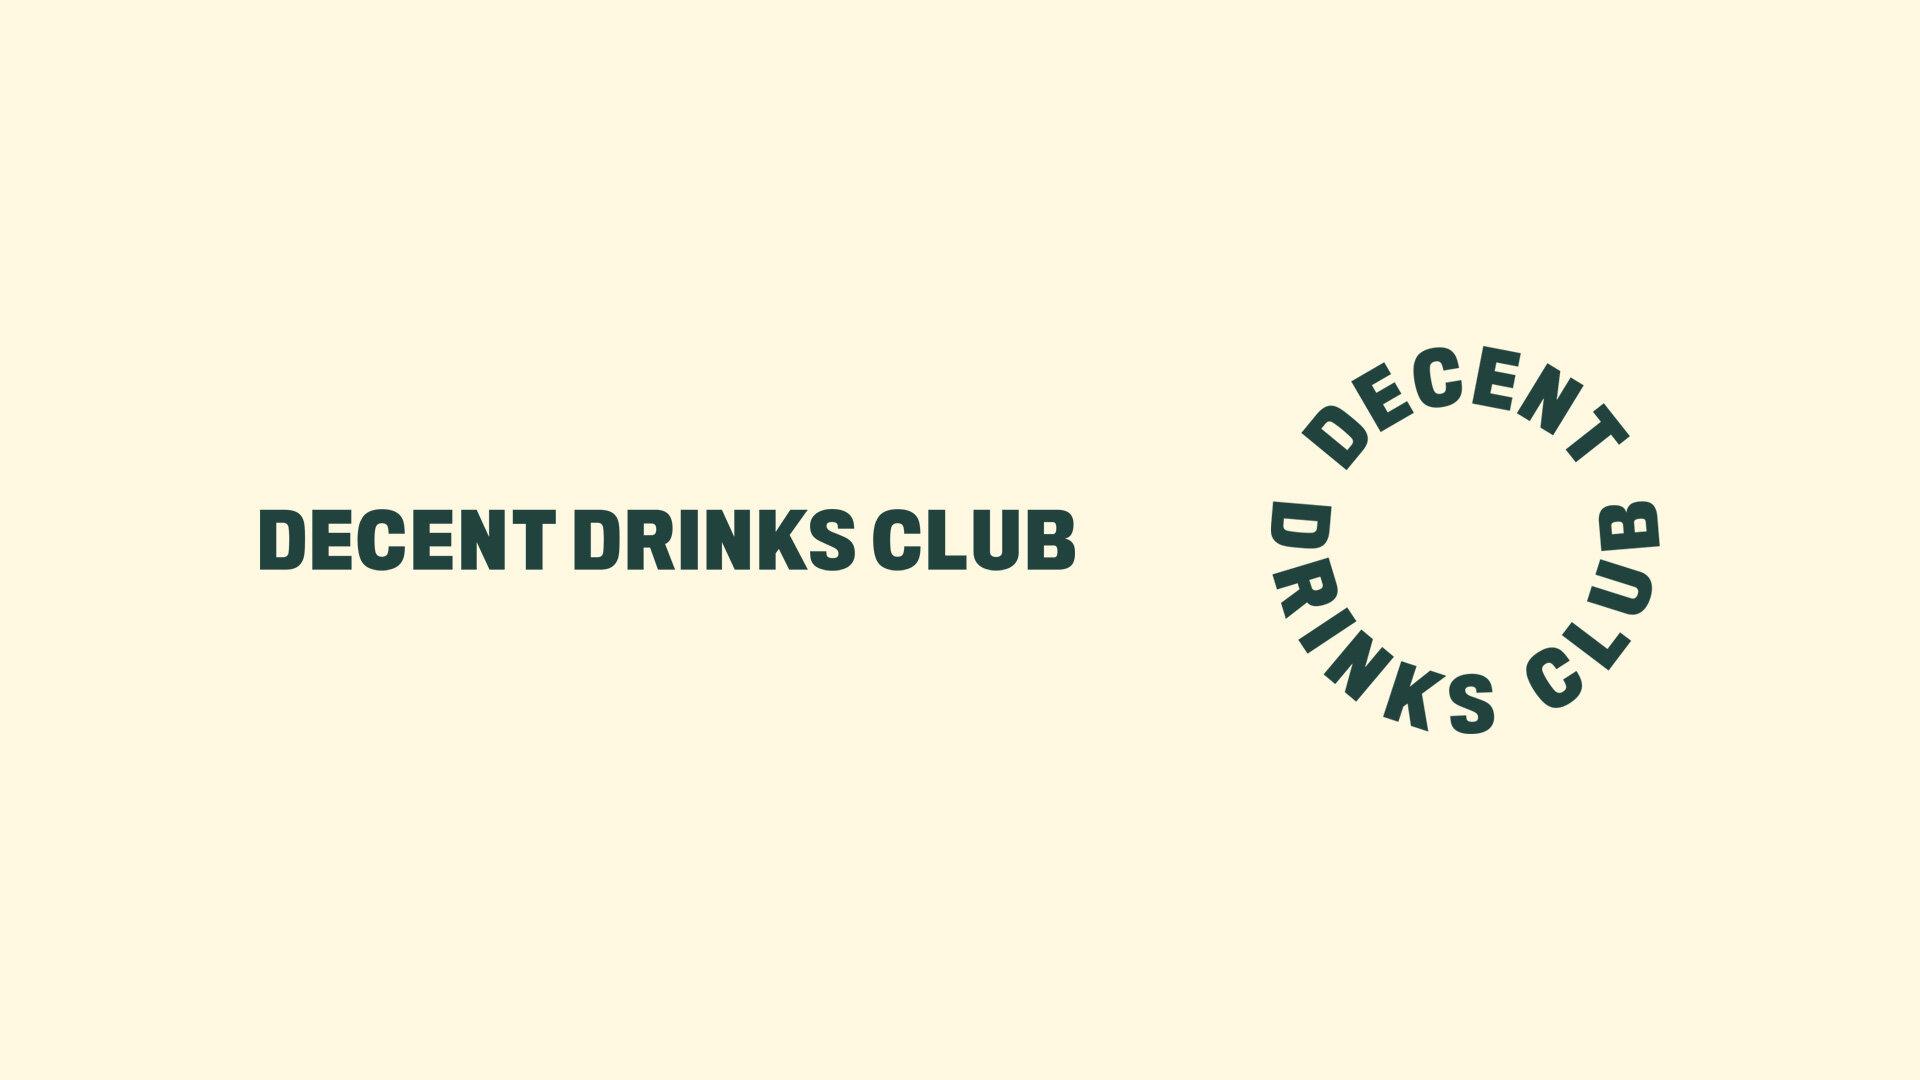 Cover image: Decent Drinks Club branding